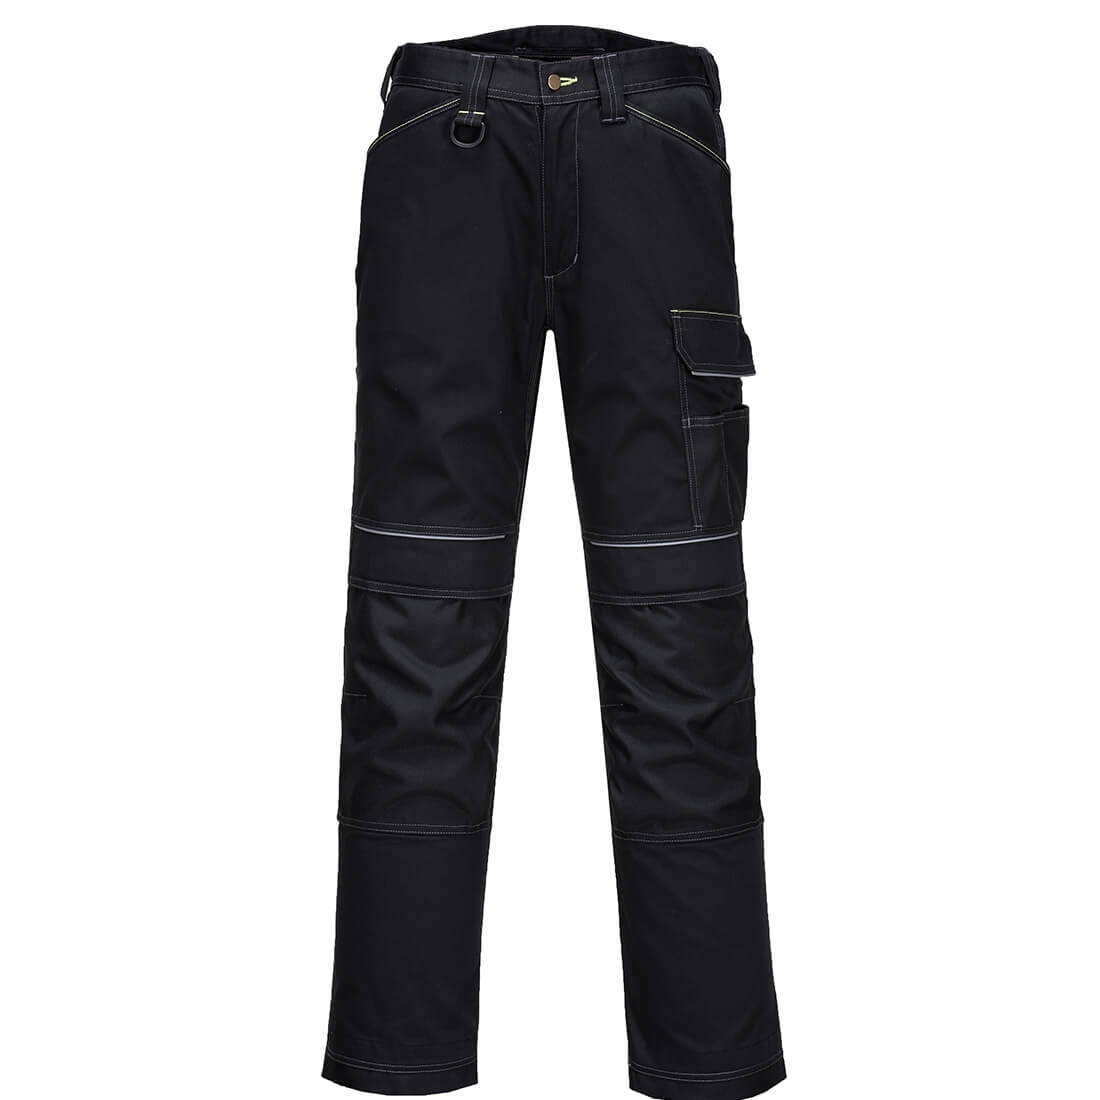 Pantaloni Urban Work - Imbracaminte de protectie